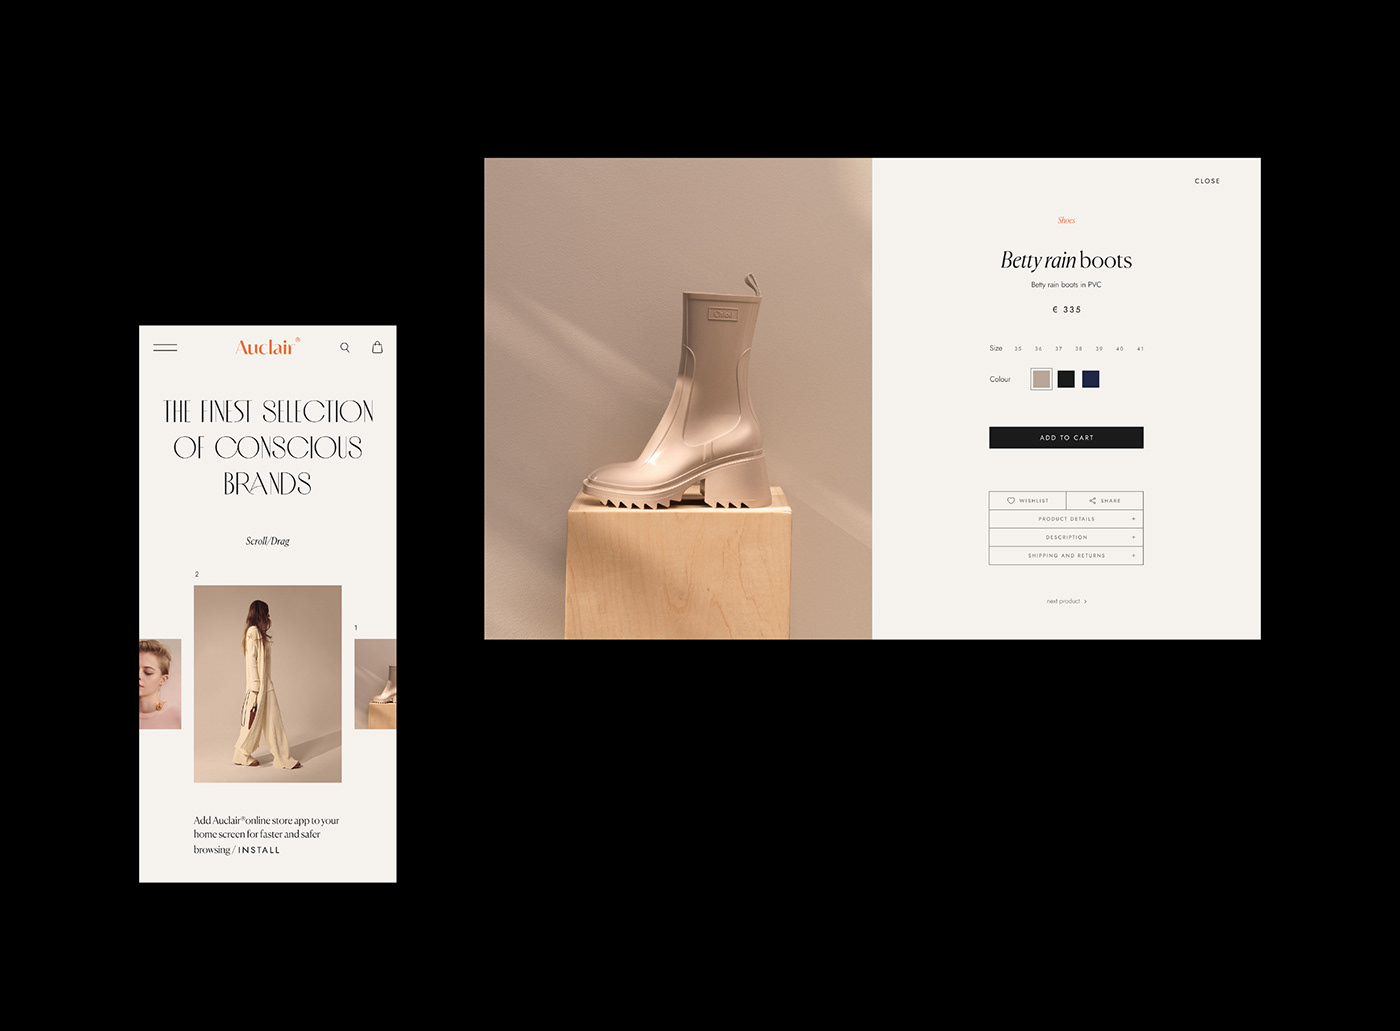 clothes,Ecommerce,Fashion ,interaction,luxury,minimalist,online store,Sustainability,UI/UX,Website